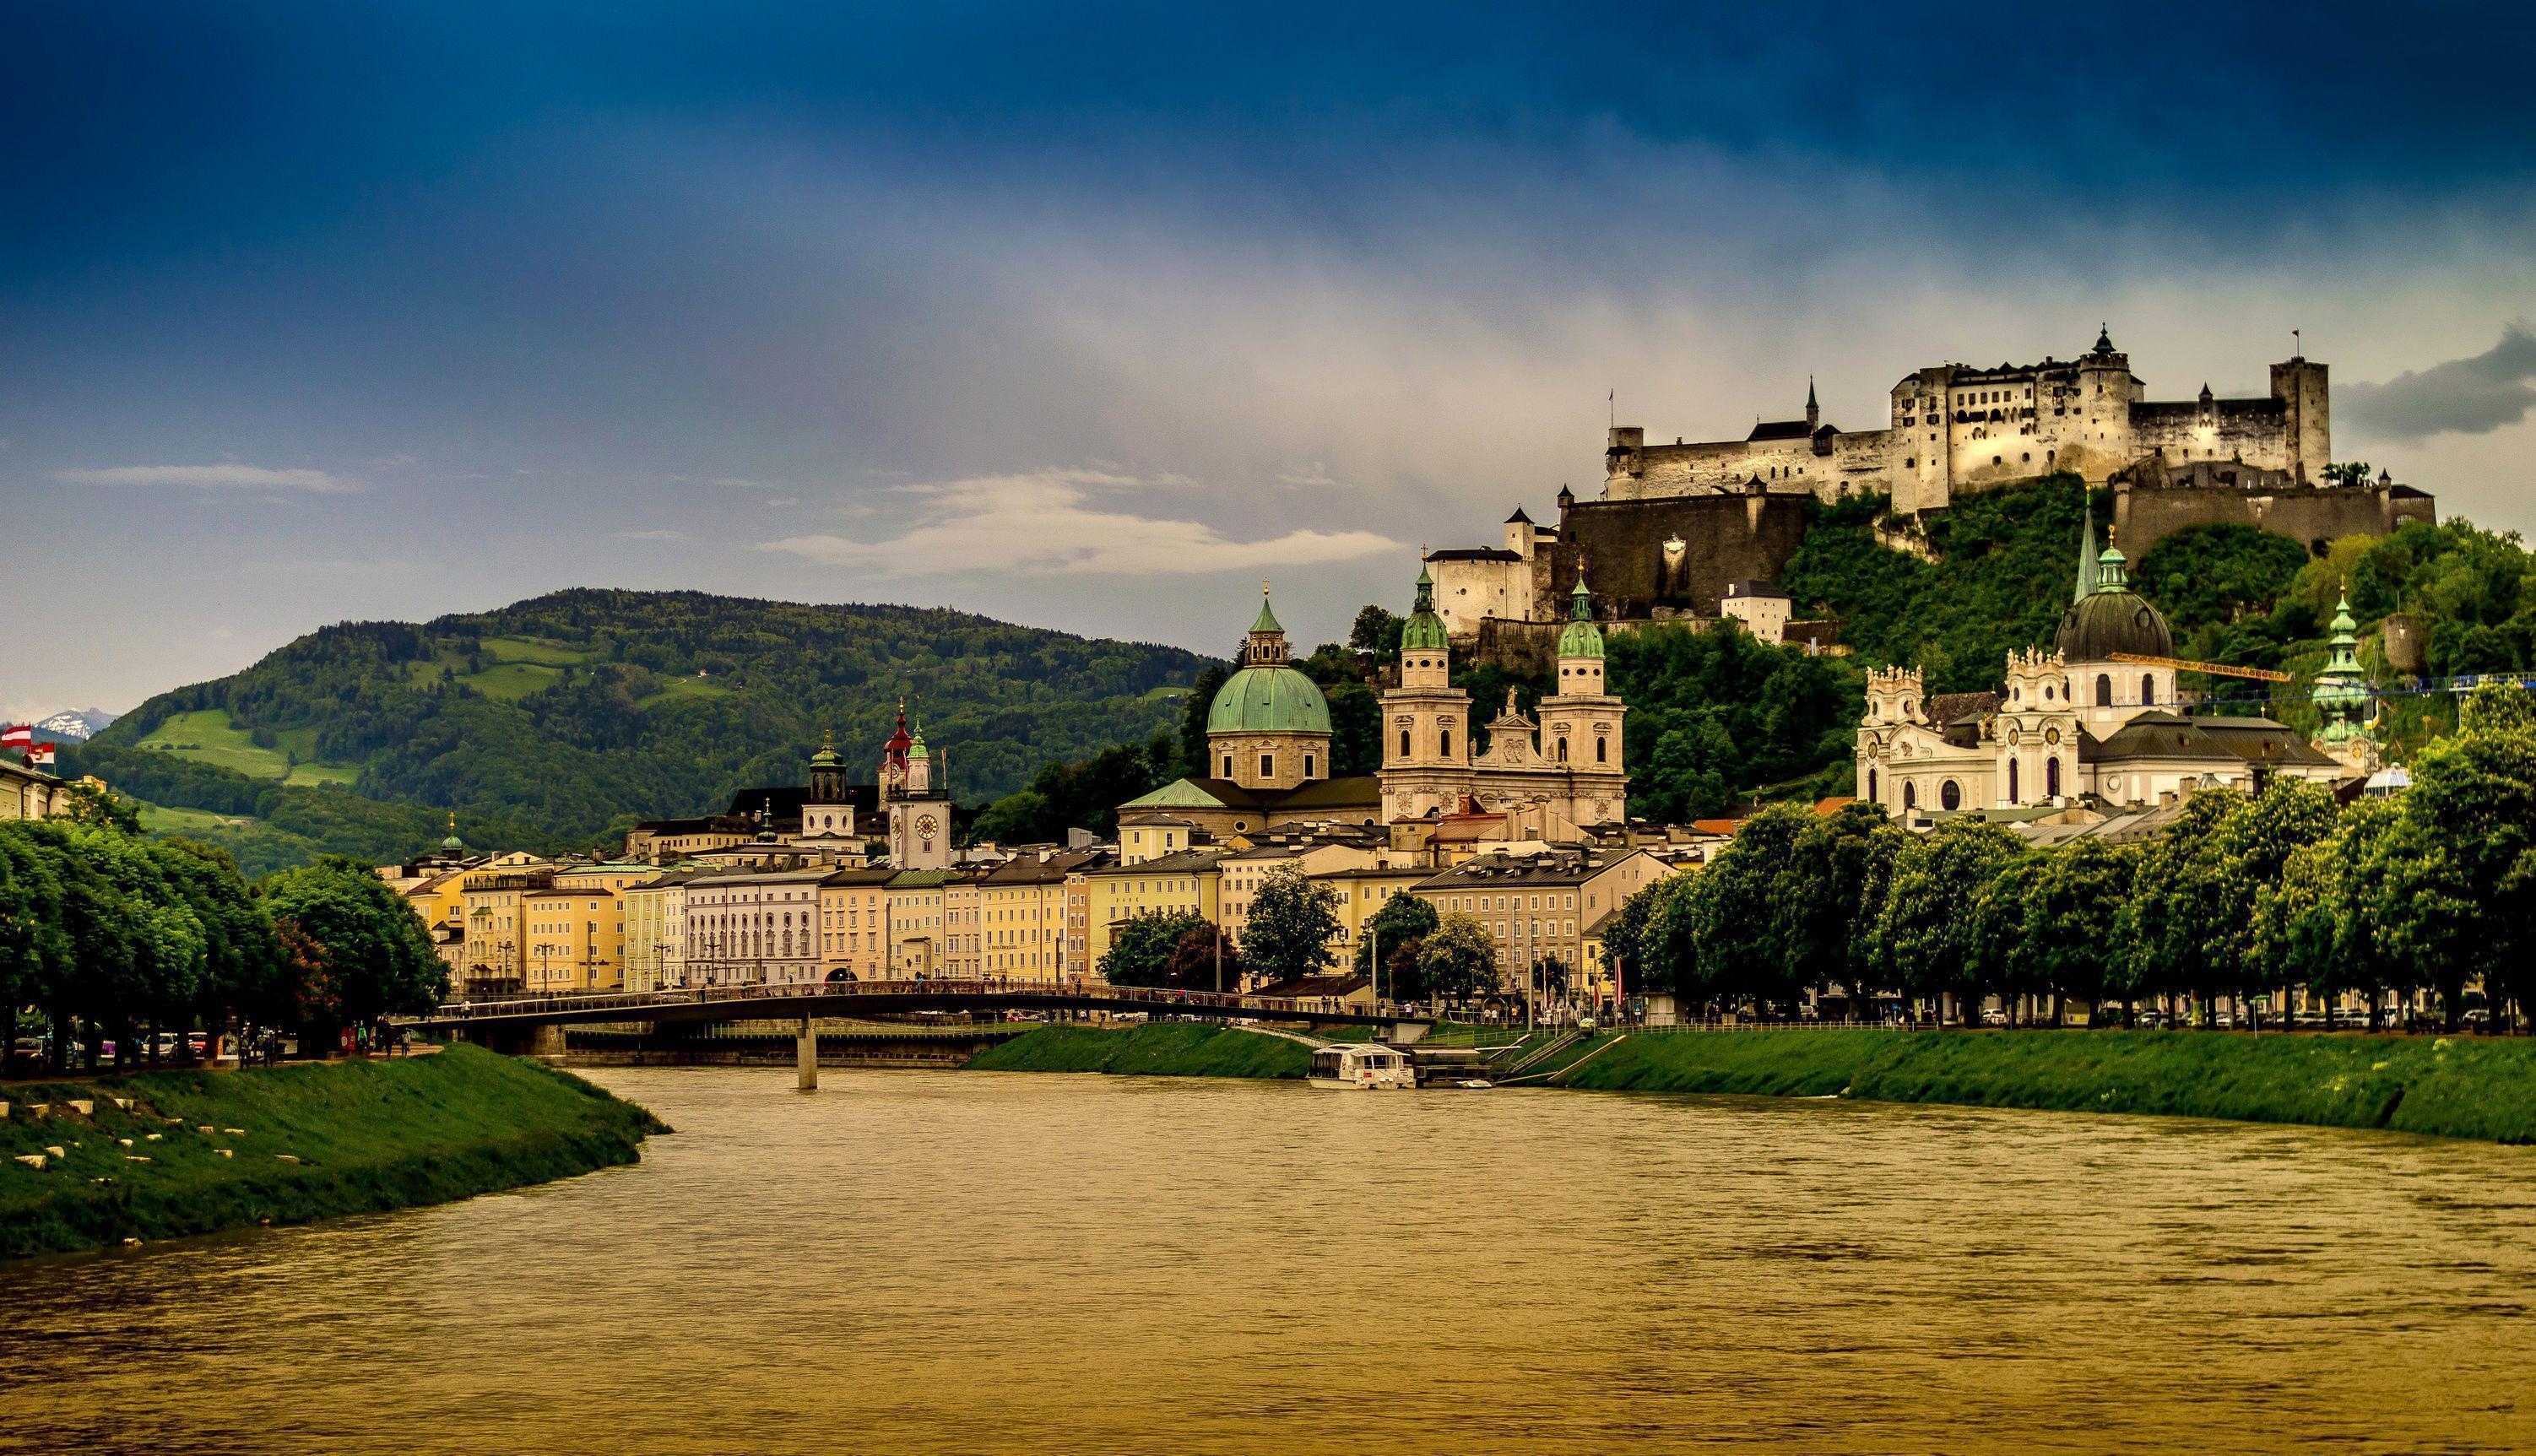 salzburg austria hd windows wallpapers - HD1920×1200